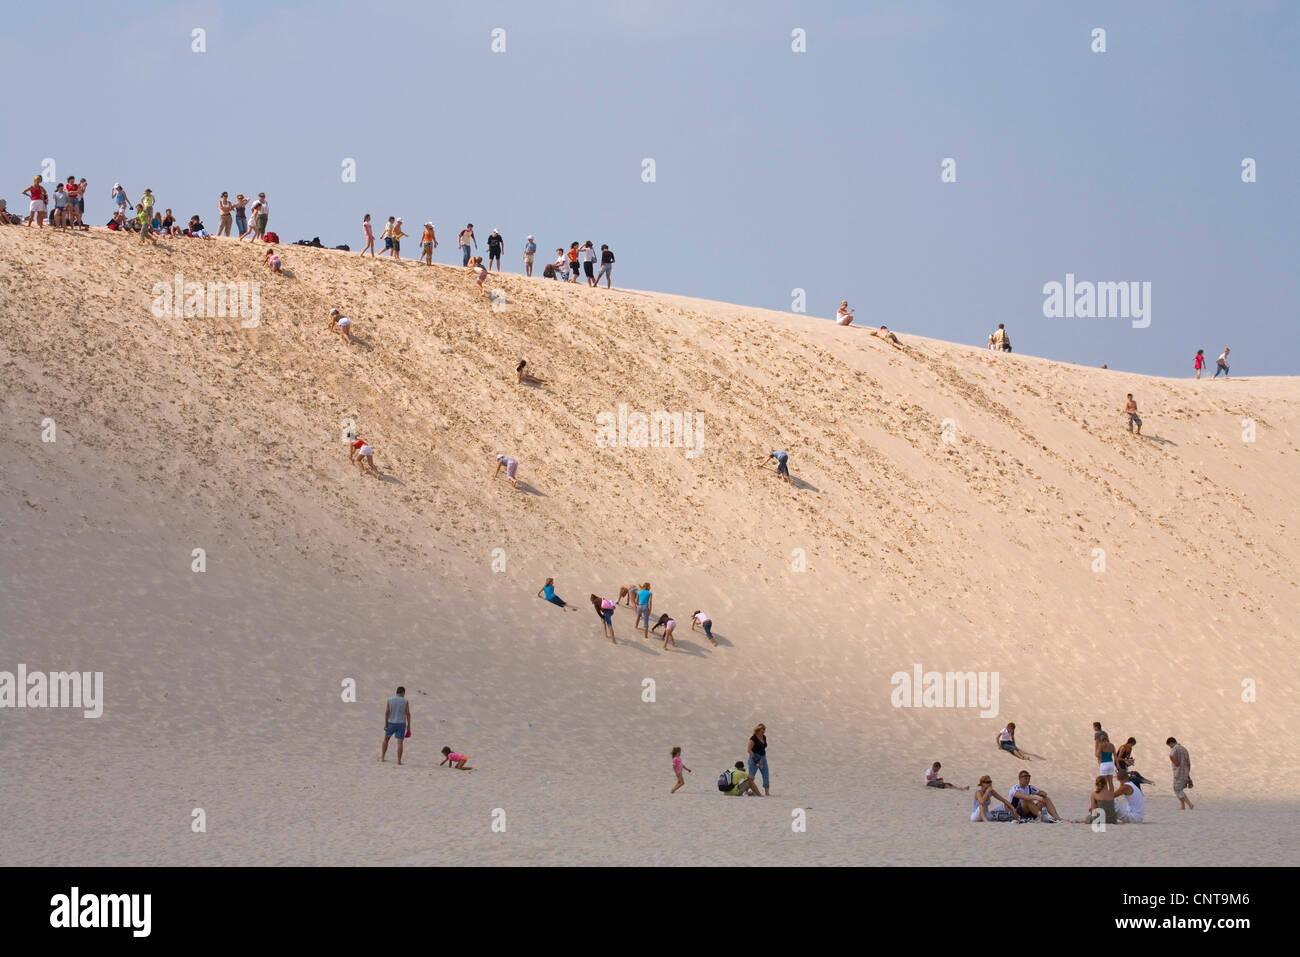 shifting sand dune, Poland, Slowinski National Park Stock Photo